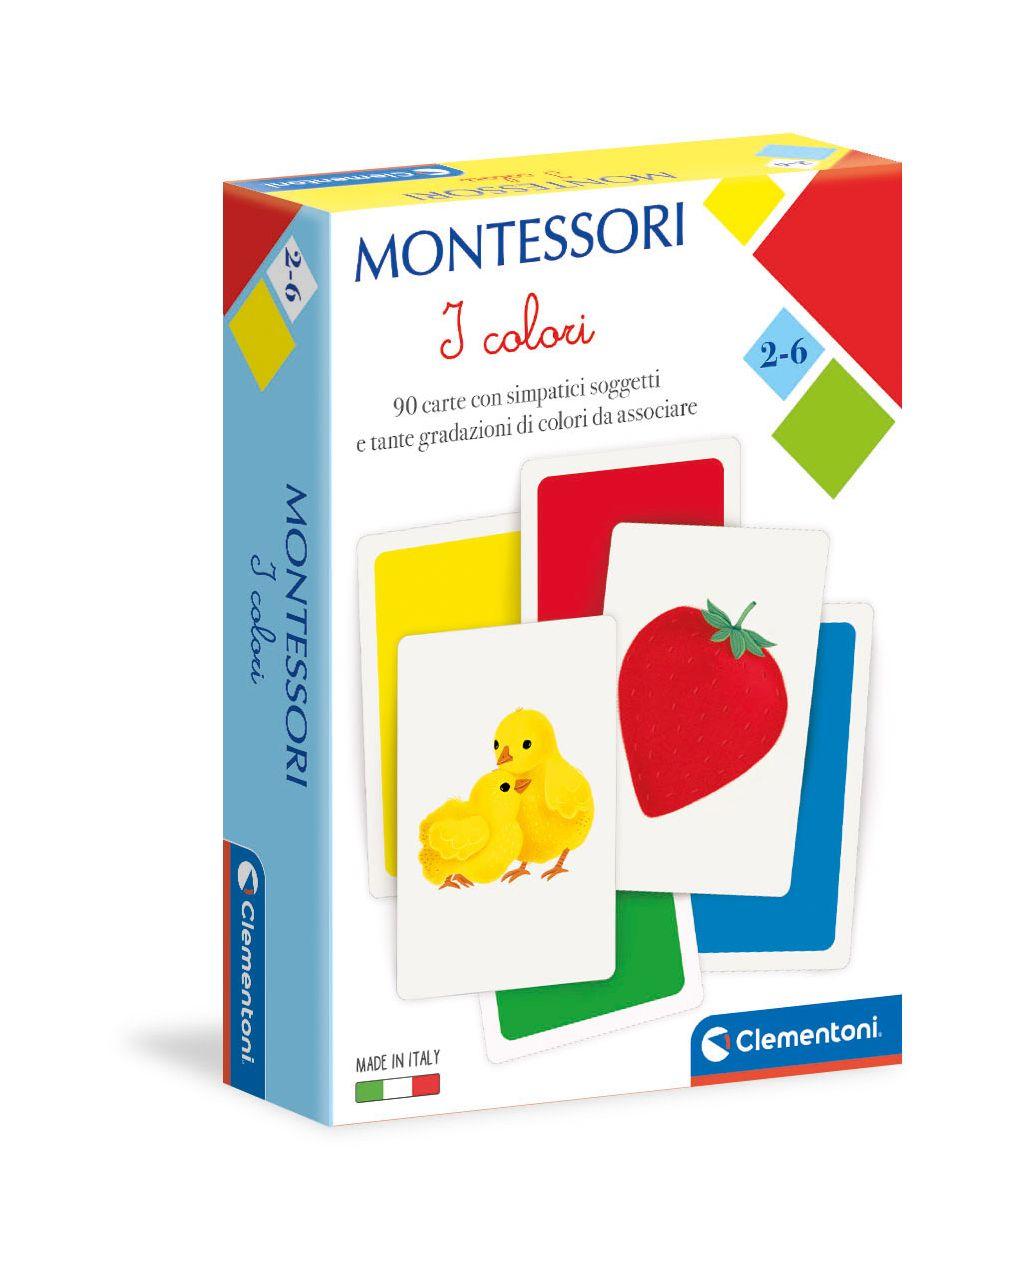 Clementoni - montessori - cores - Clementoni